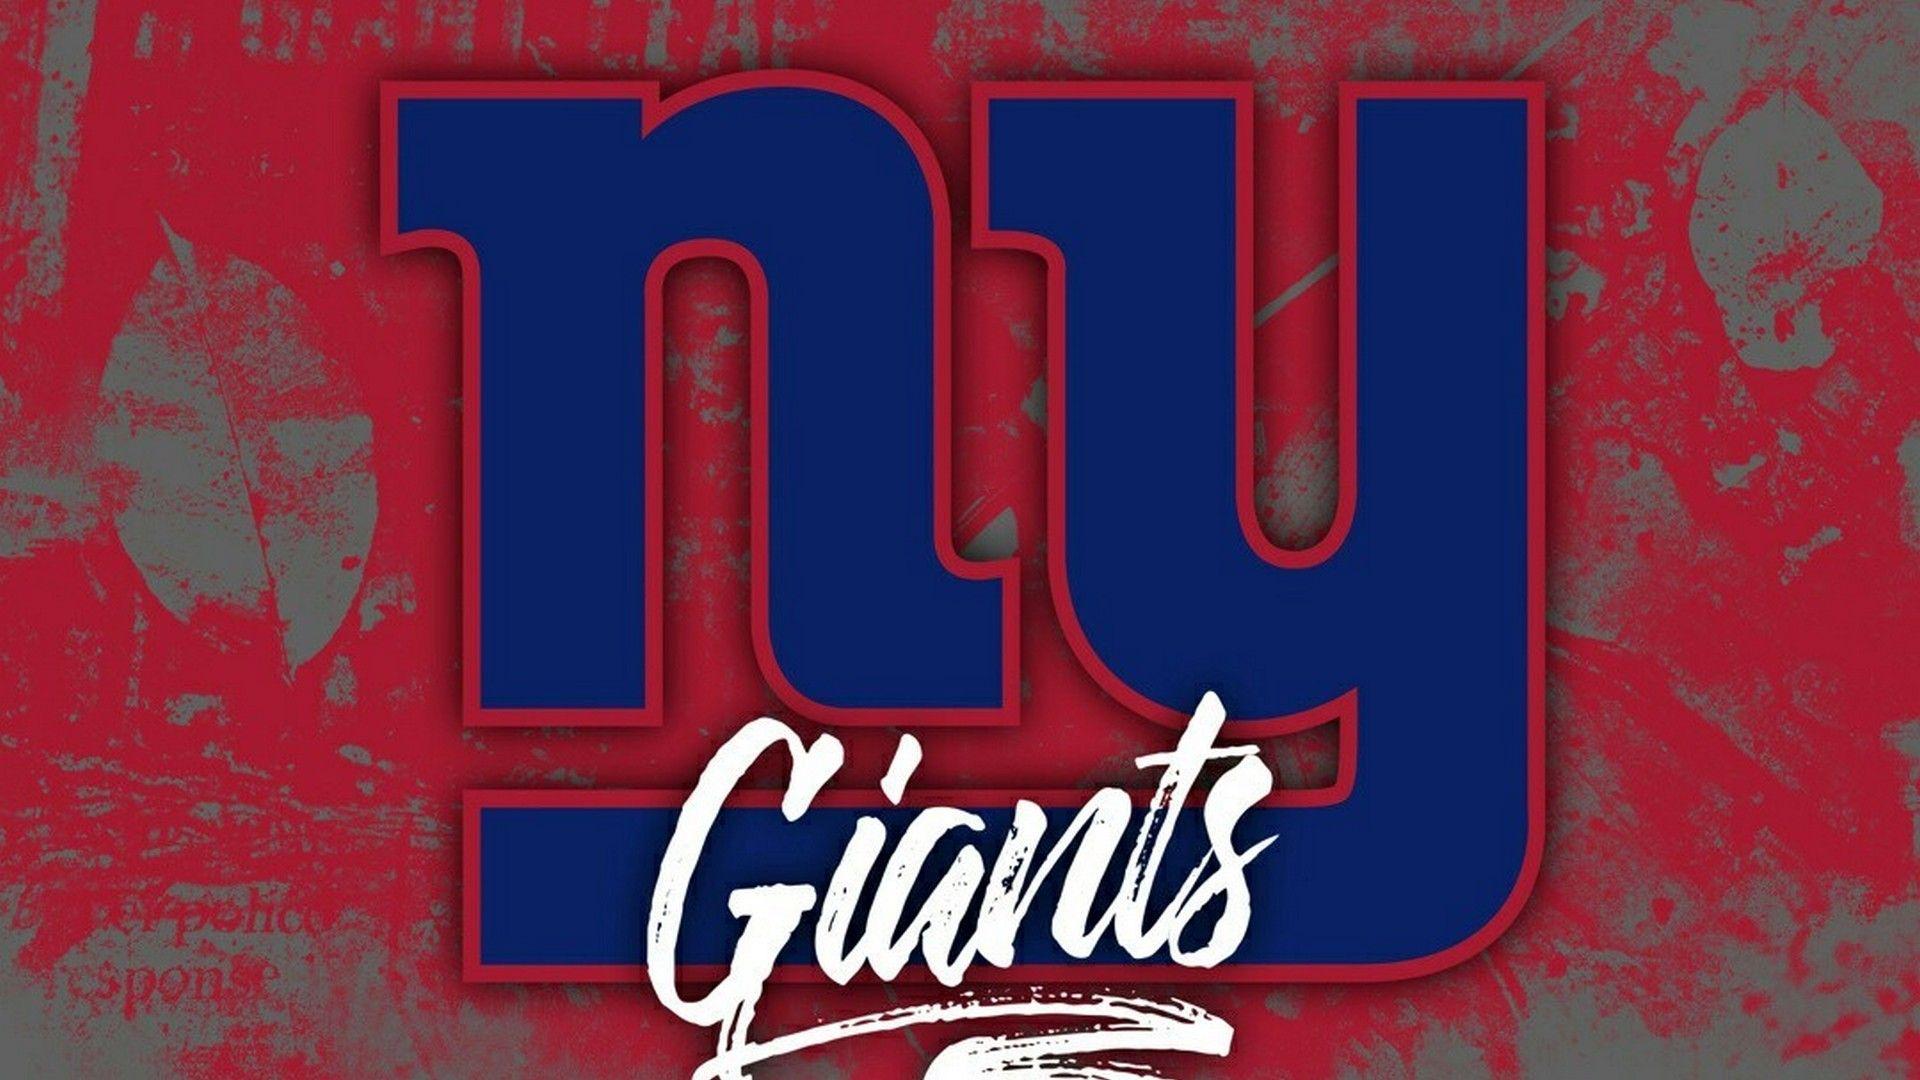 Wallpaper Desktop New York Giants Hd Football Wallpaper New